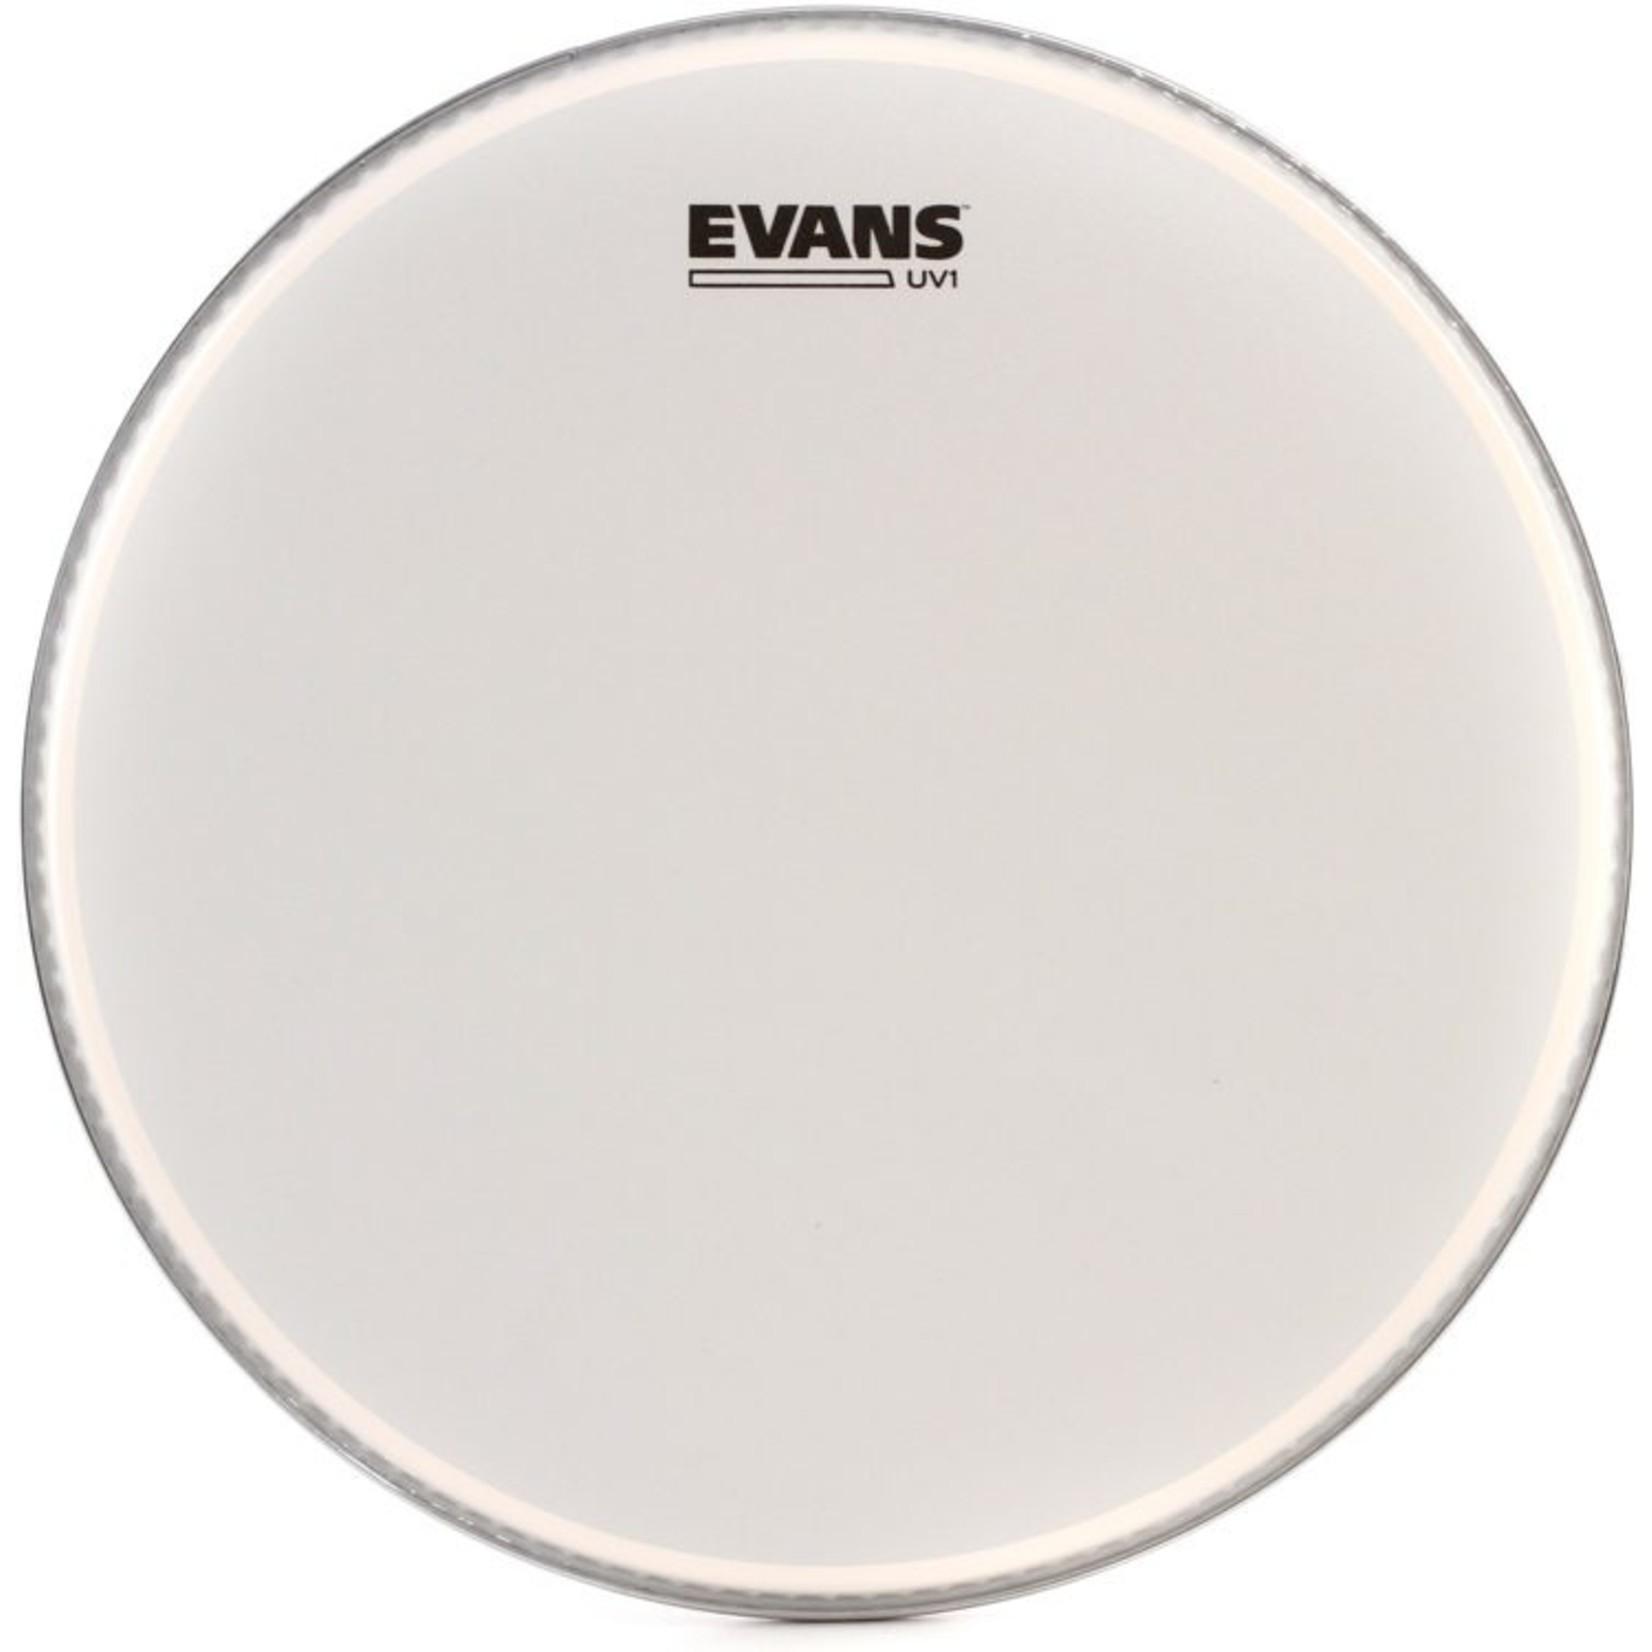 Evans Evans Coated UV1 Bass Drum